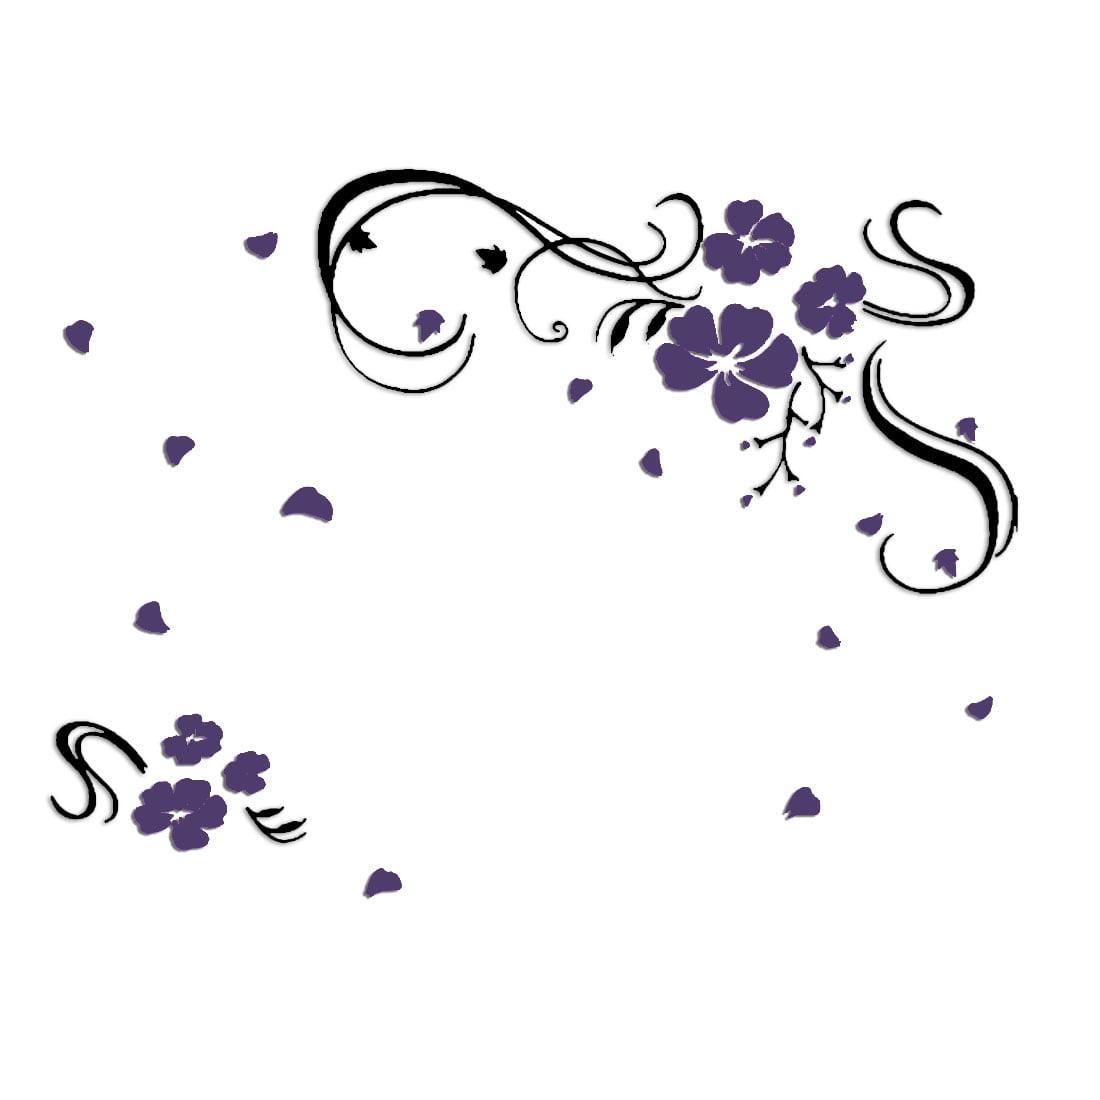 Household Acrylic Flower Print 3D Self Adhesive Wall Sticker Mural Dark Purple - image 5 of 5